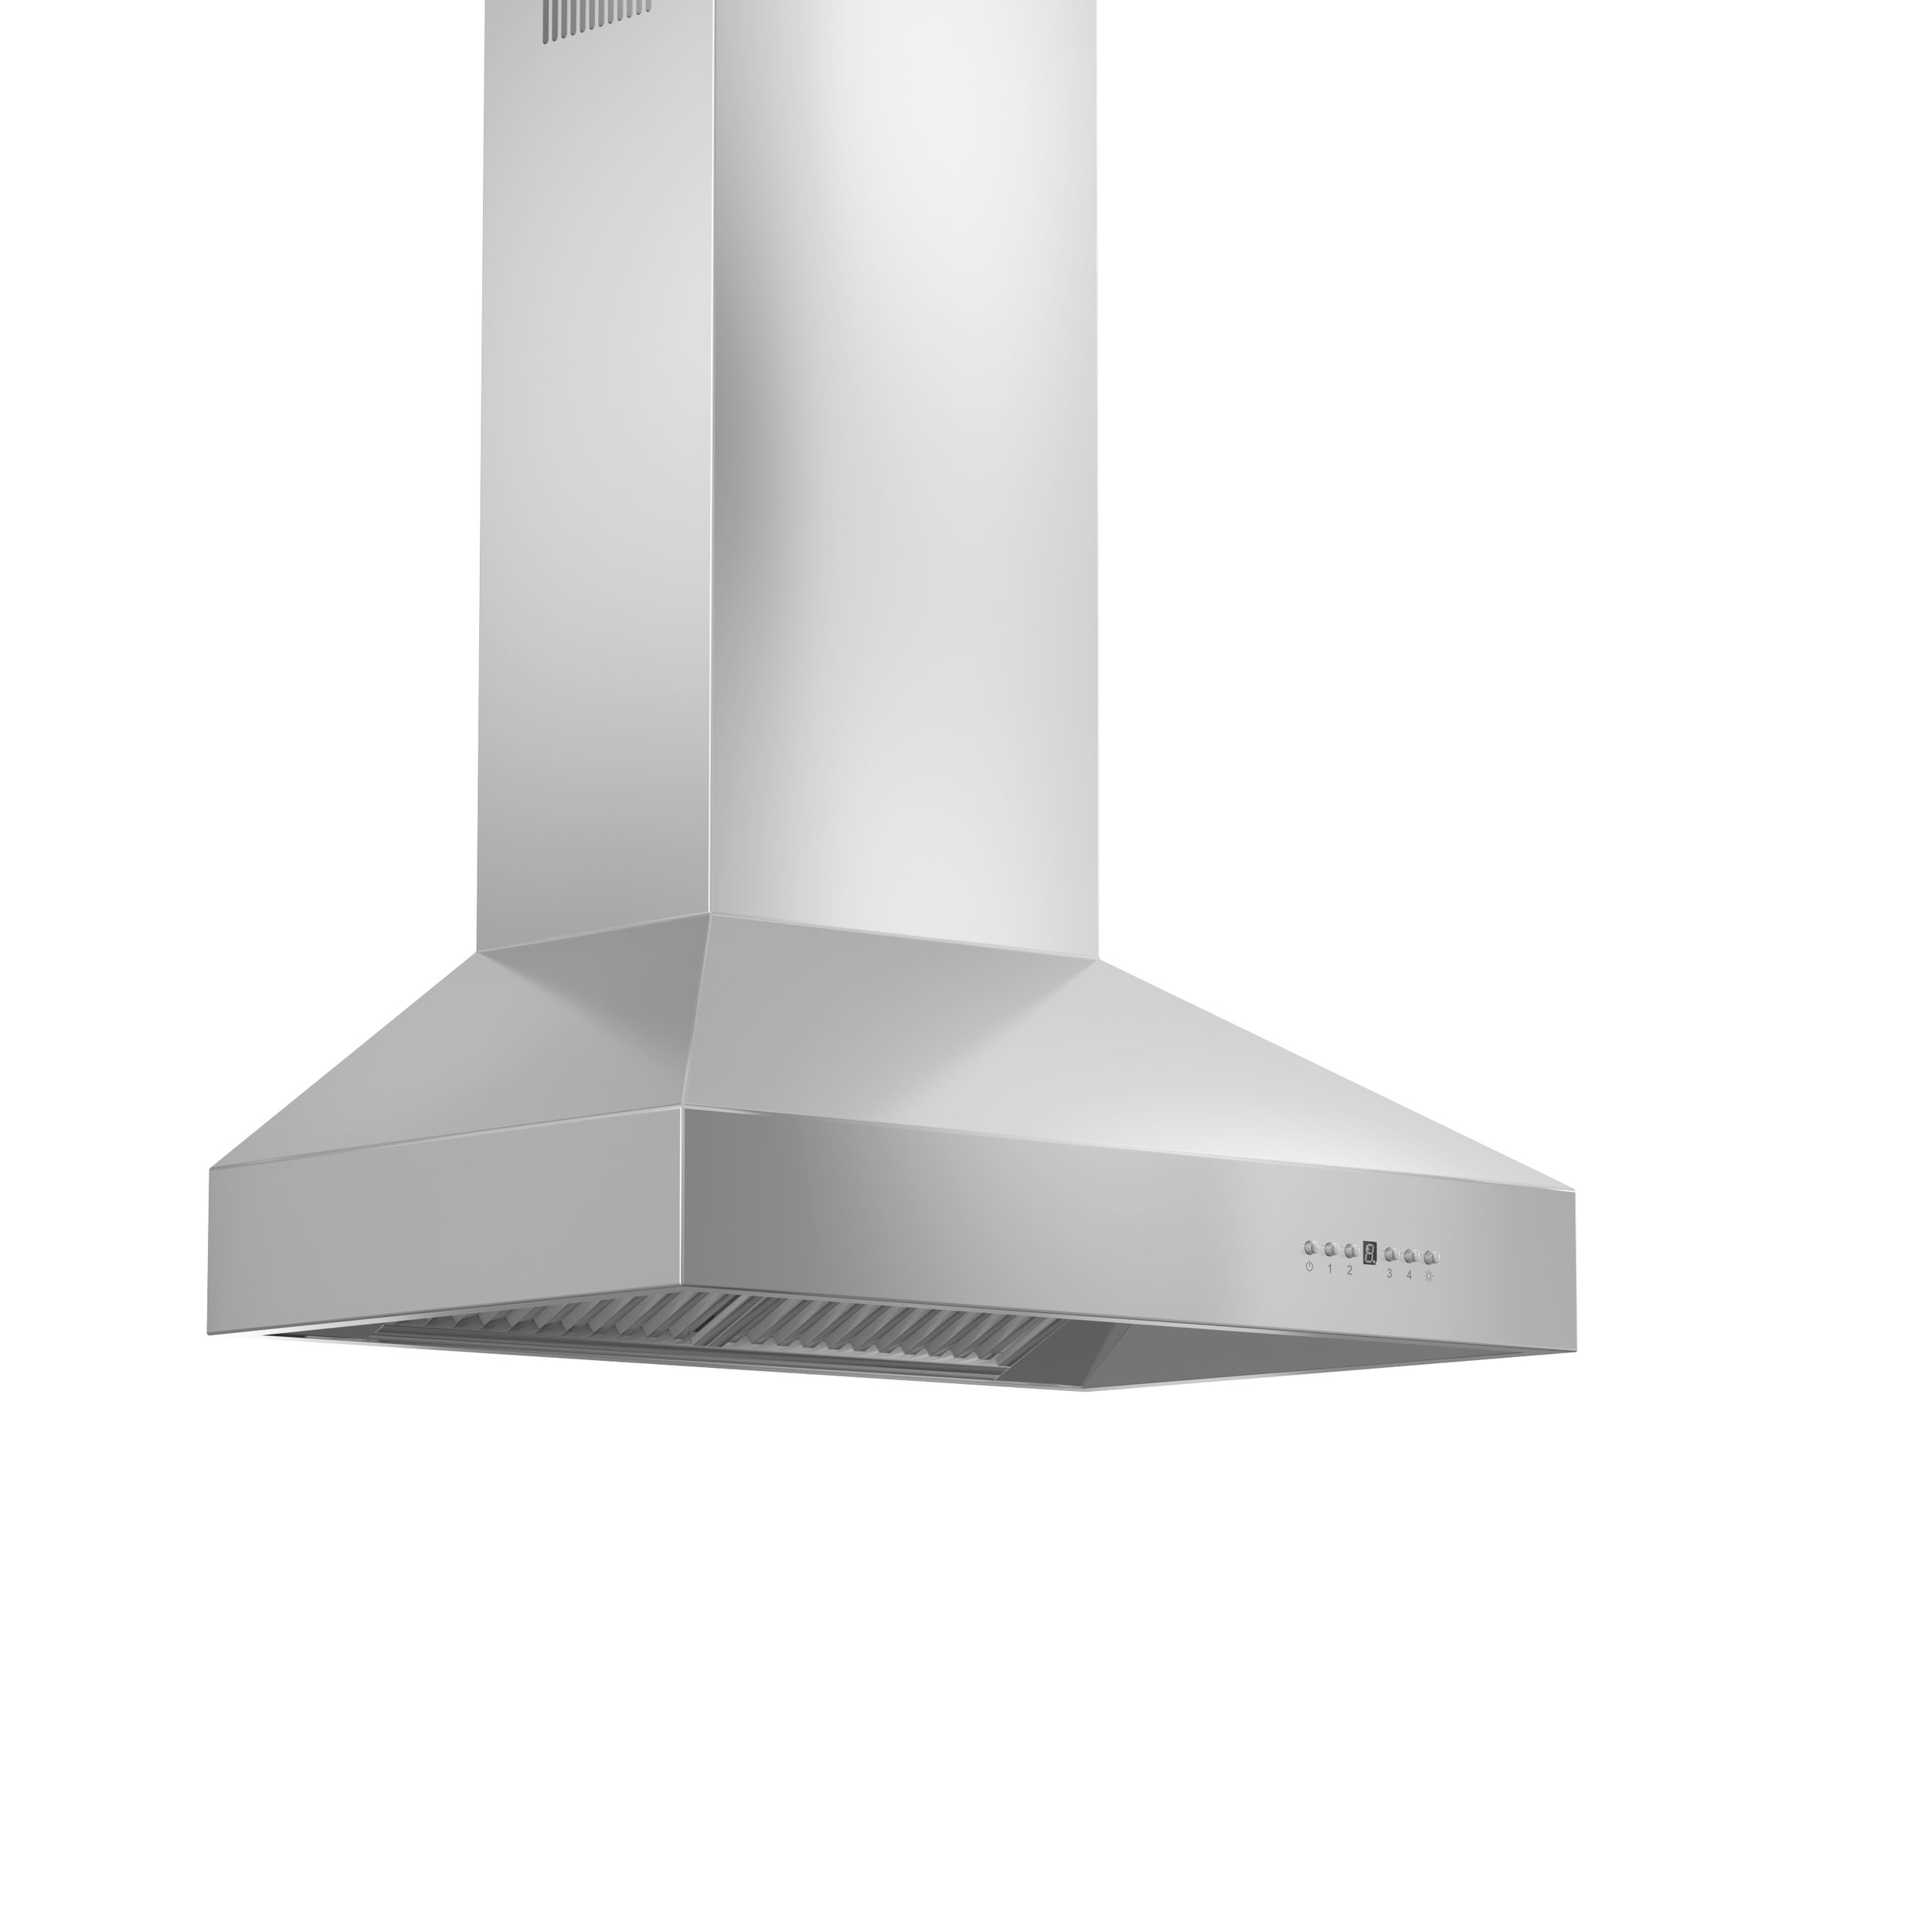 zline-stainless-steel-wall-mounted-range-hood-667-main.jpg